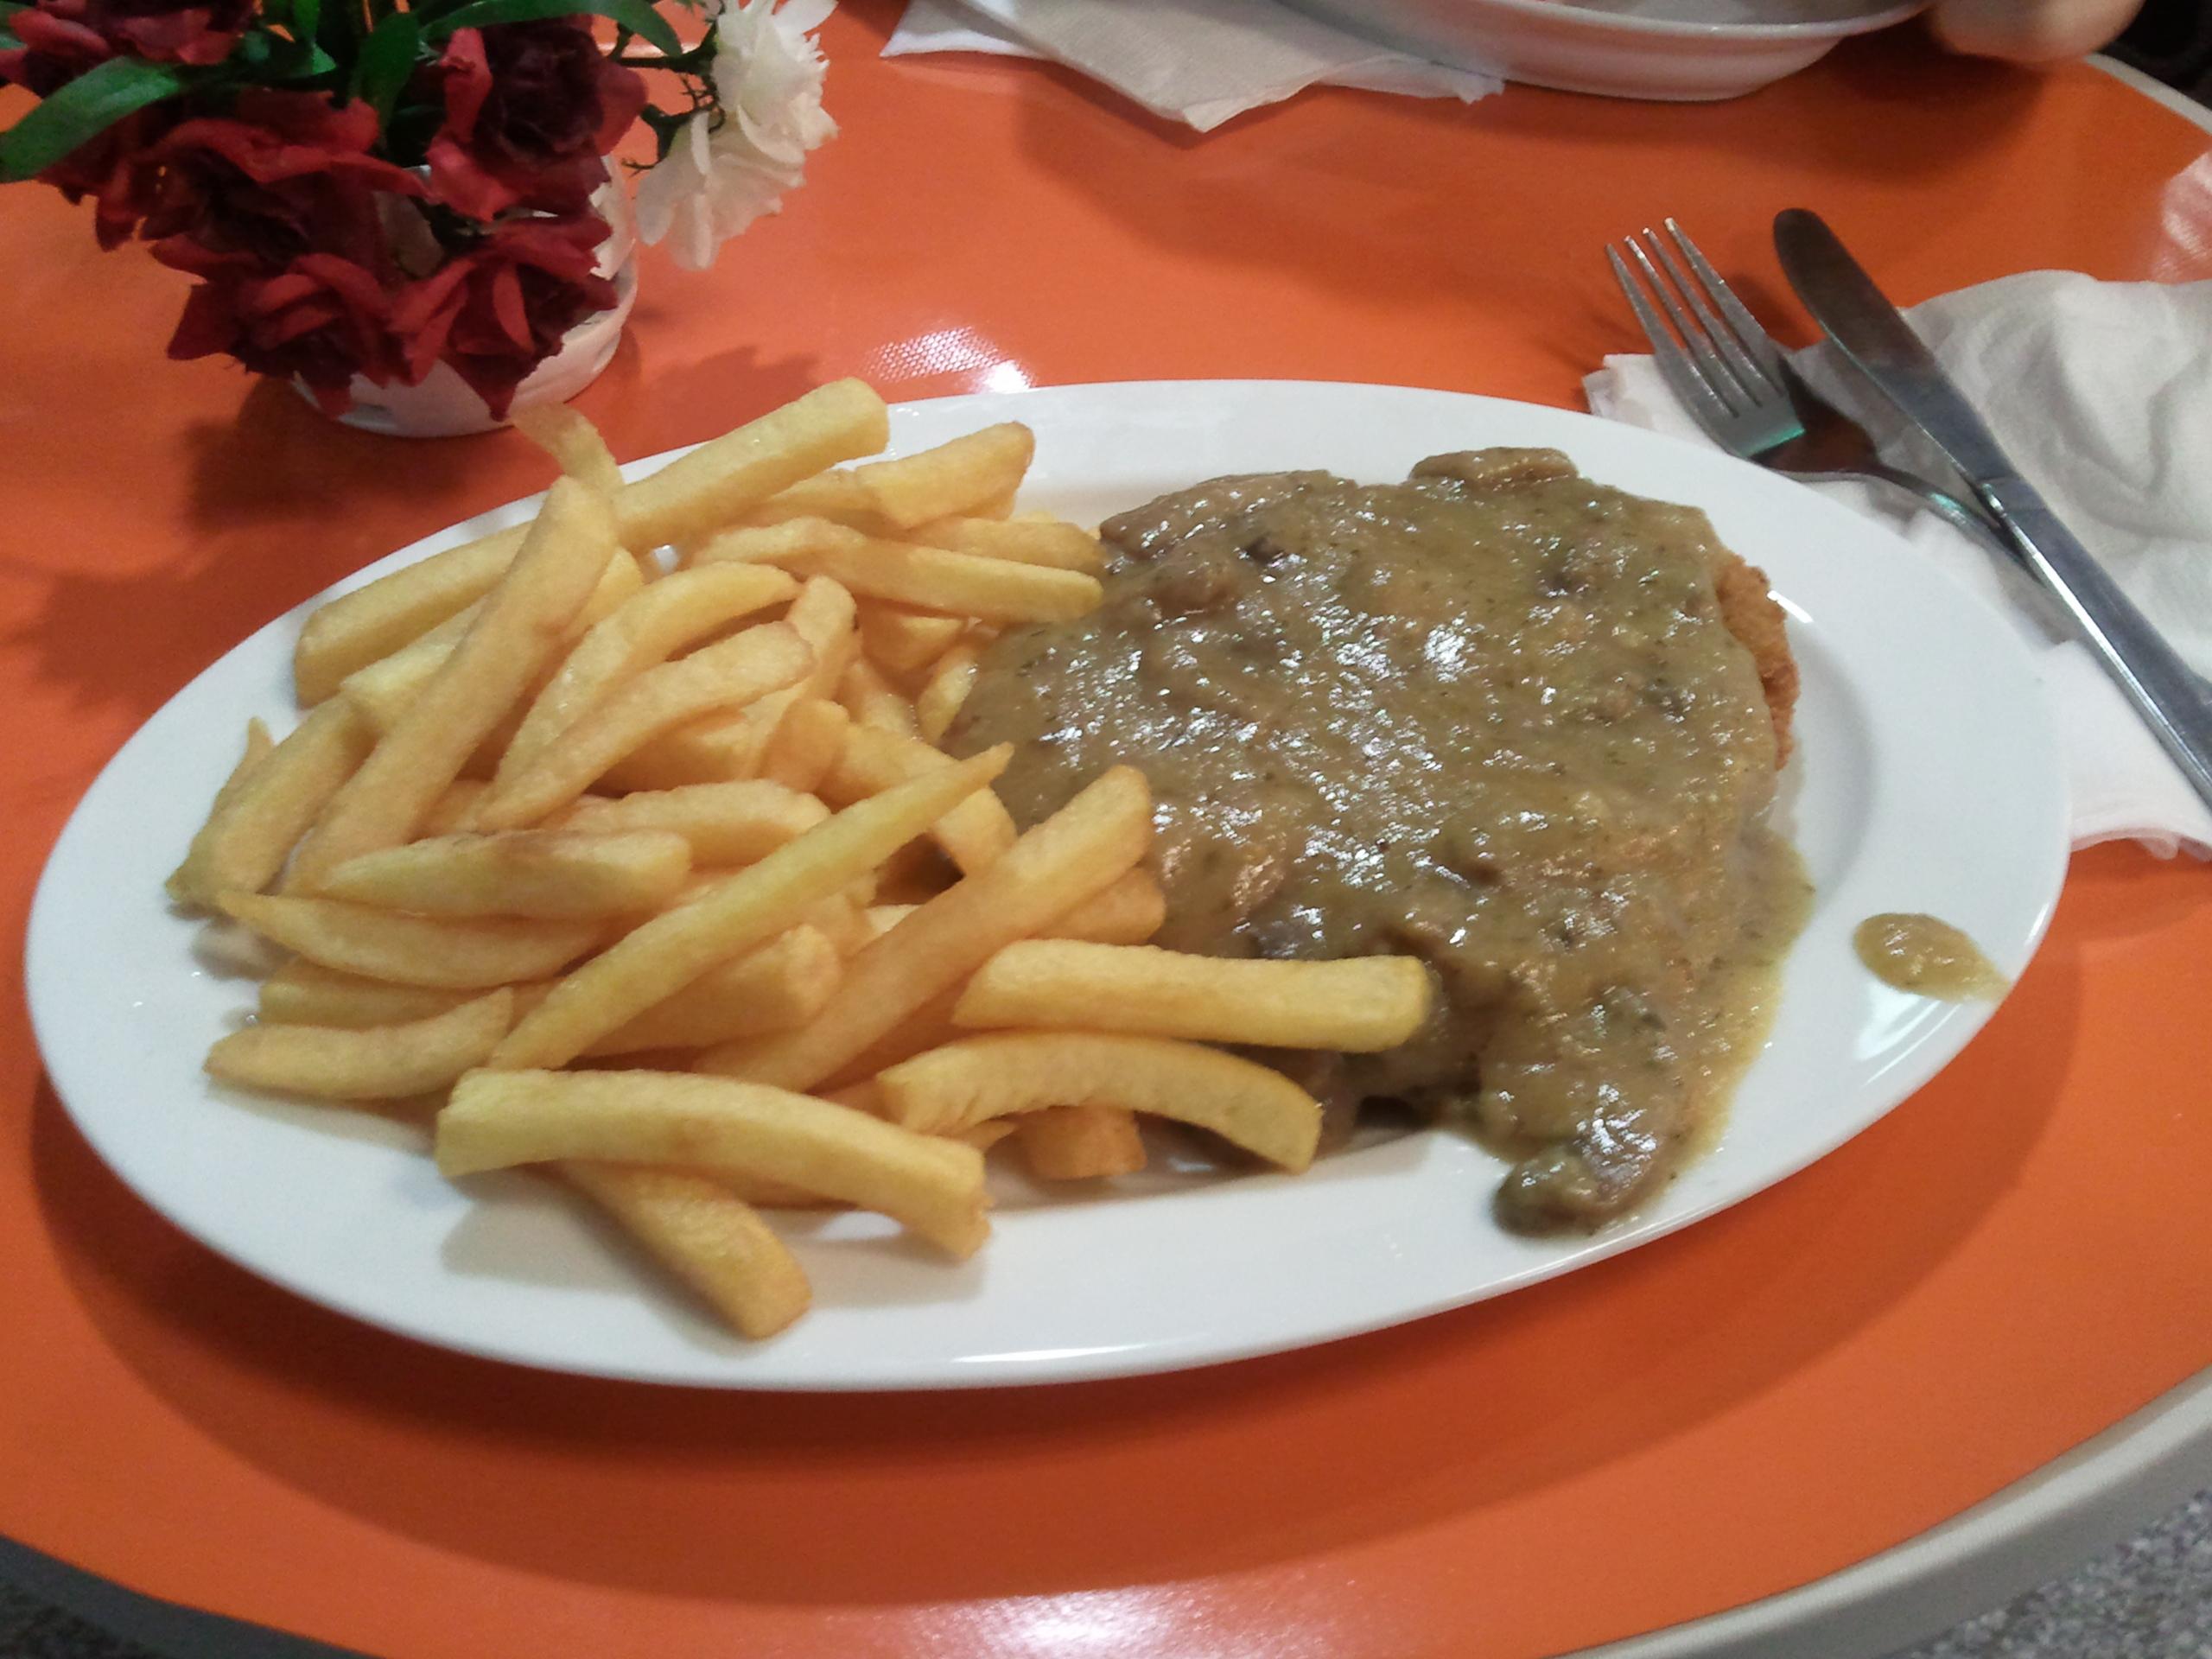 https://foodloader.net/Timber_2013-01-04_Schnitzel_mit_Pommes.jpg